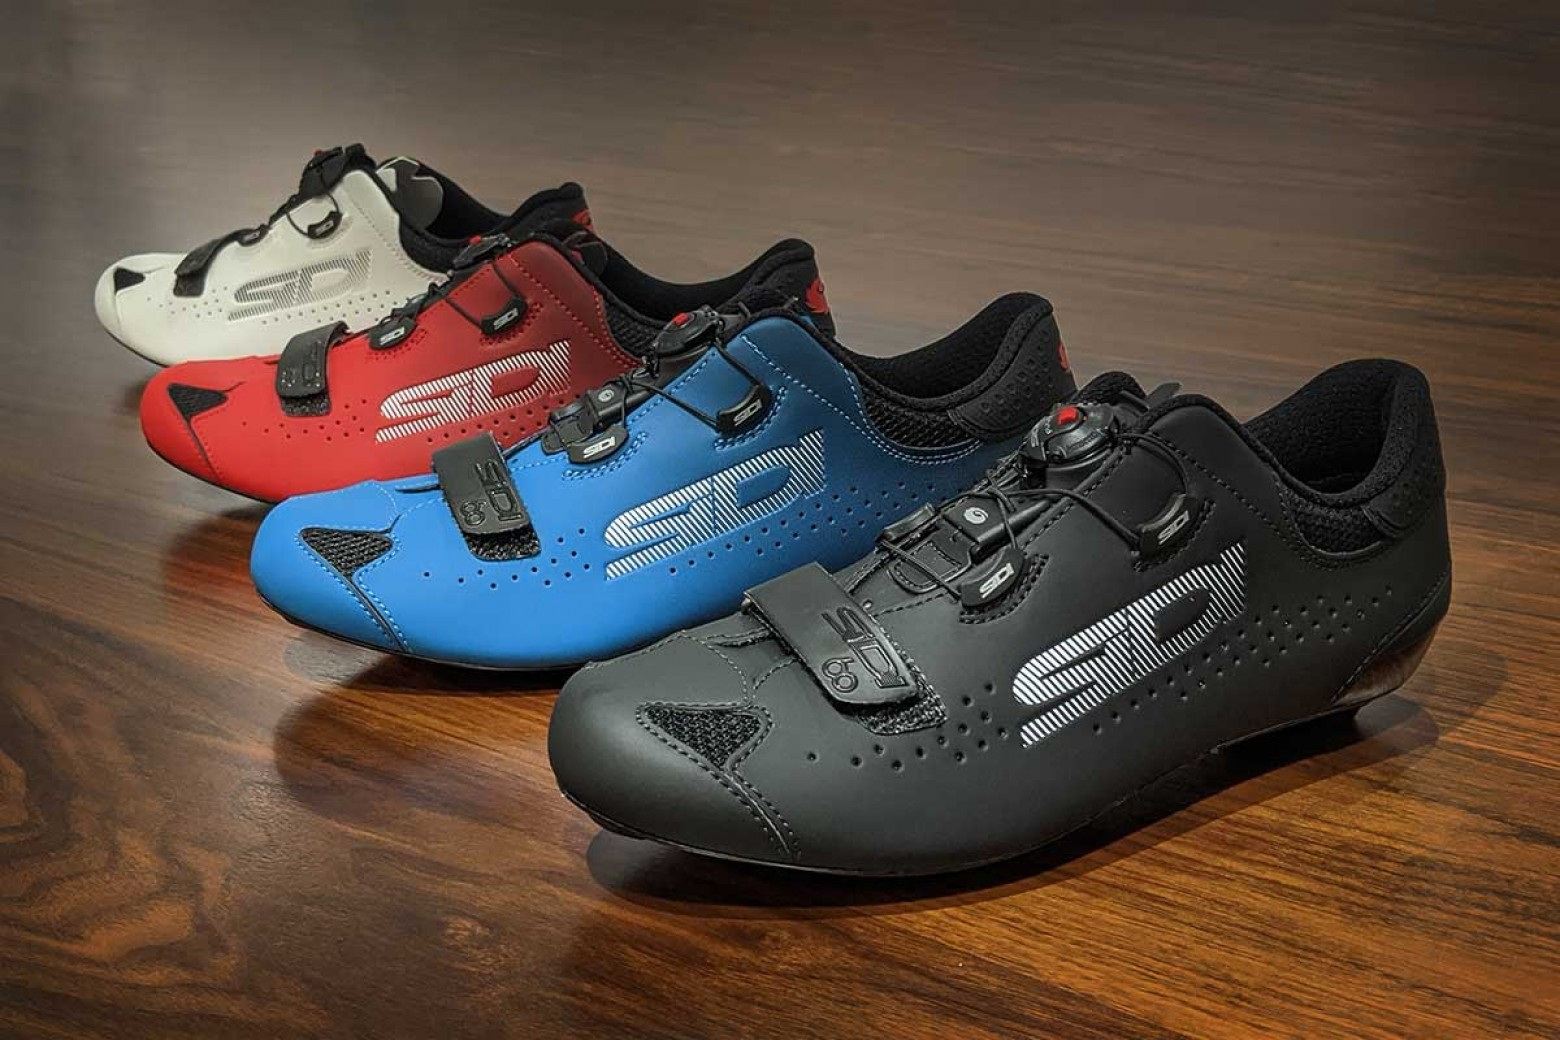 sidi-speed-mountain-bike/